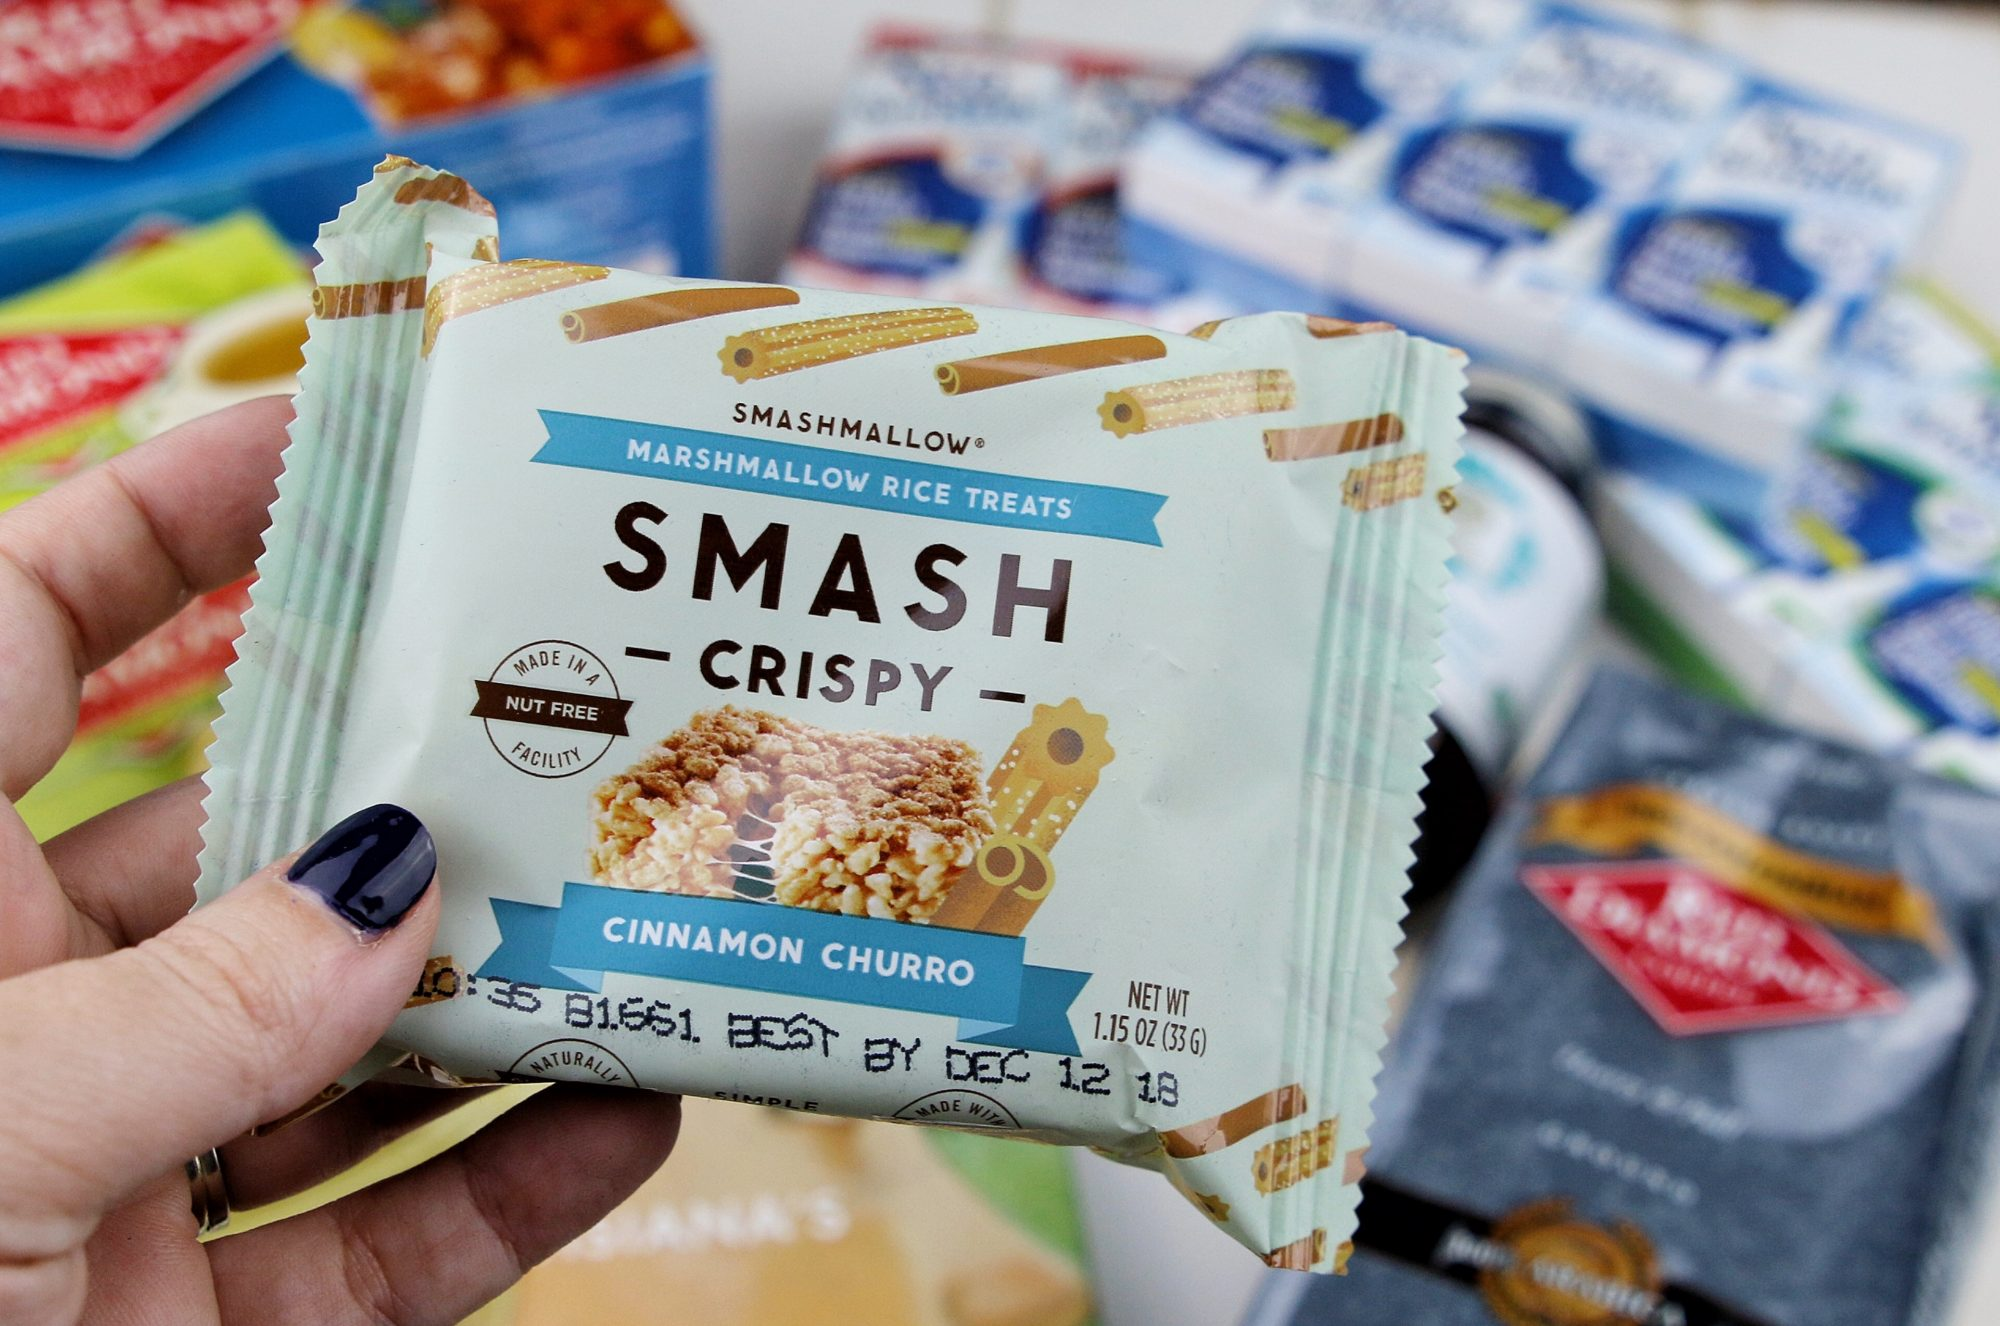 Smash Crispy